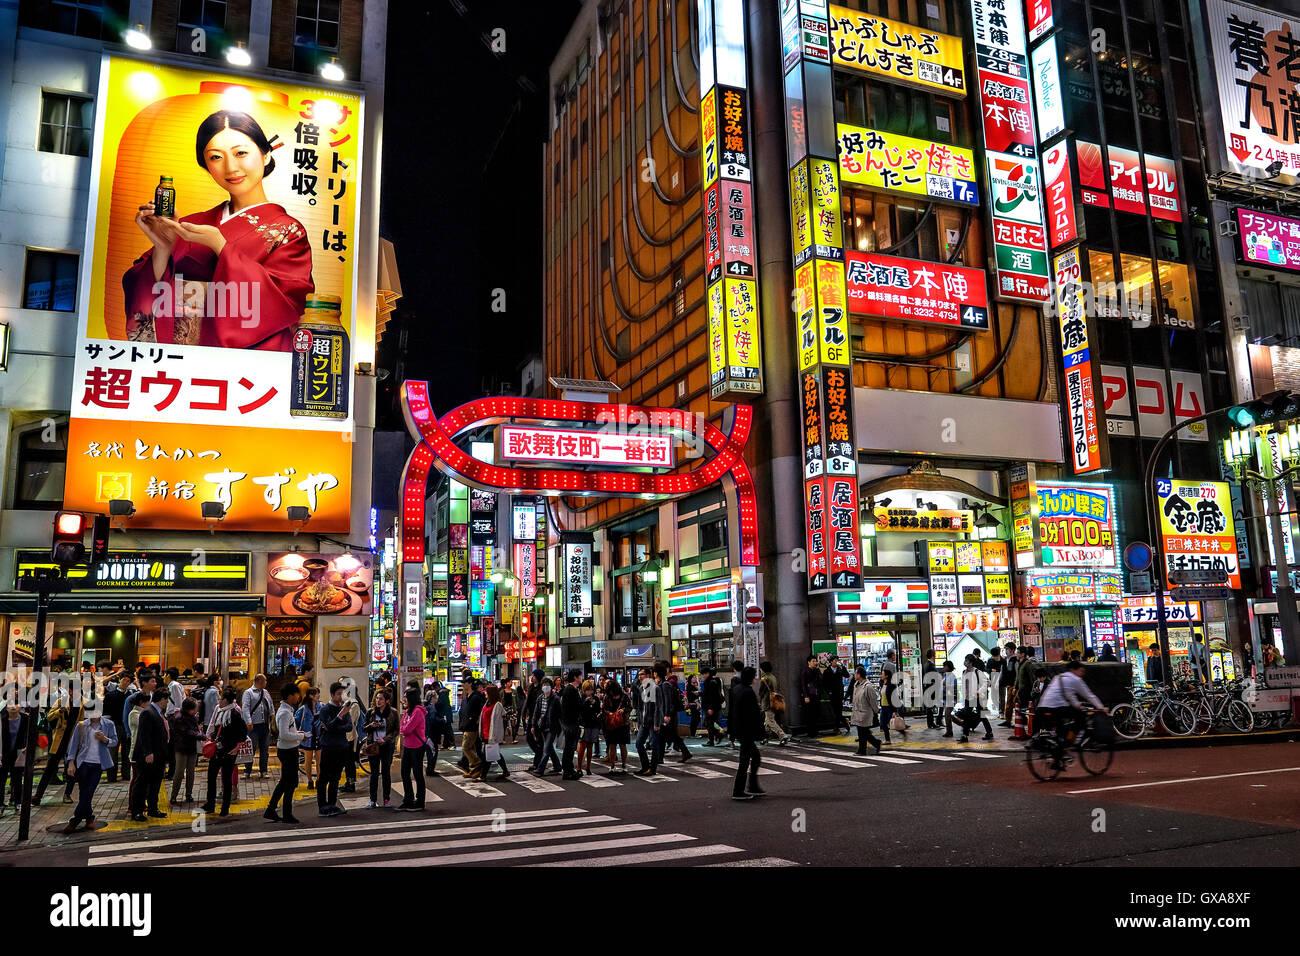 Japan, Honshu island, Kanto, Tokyo, Kabukicho district. - Stock Image